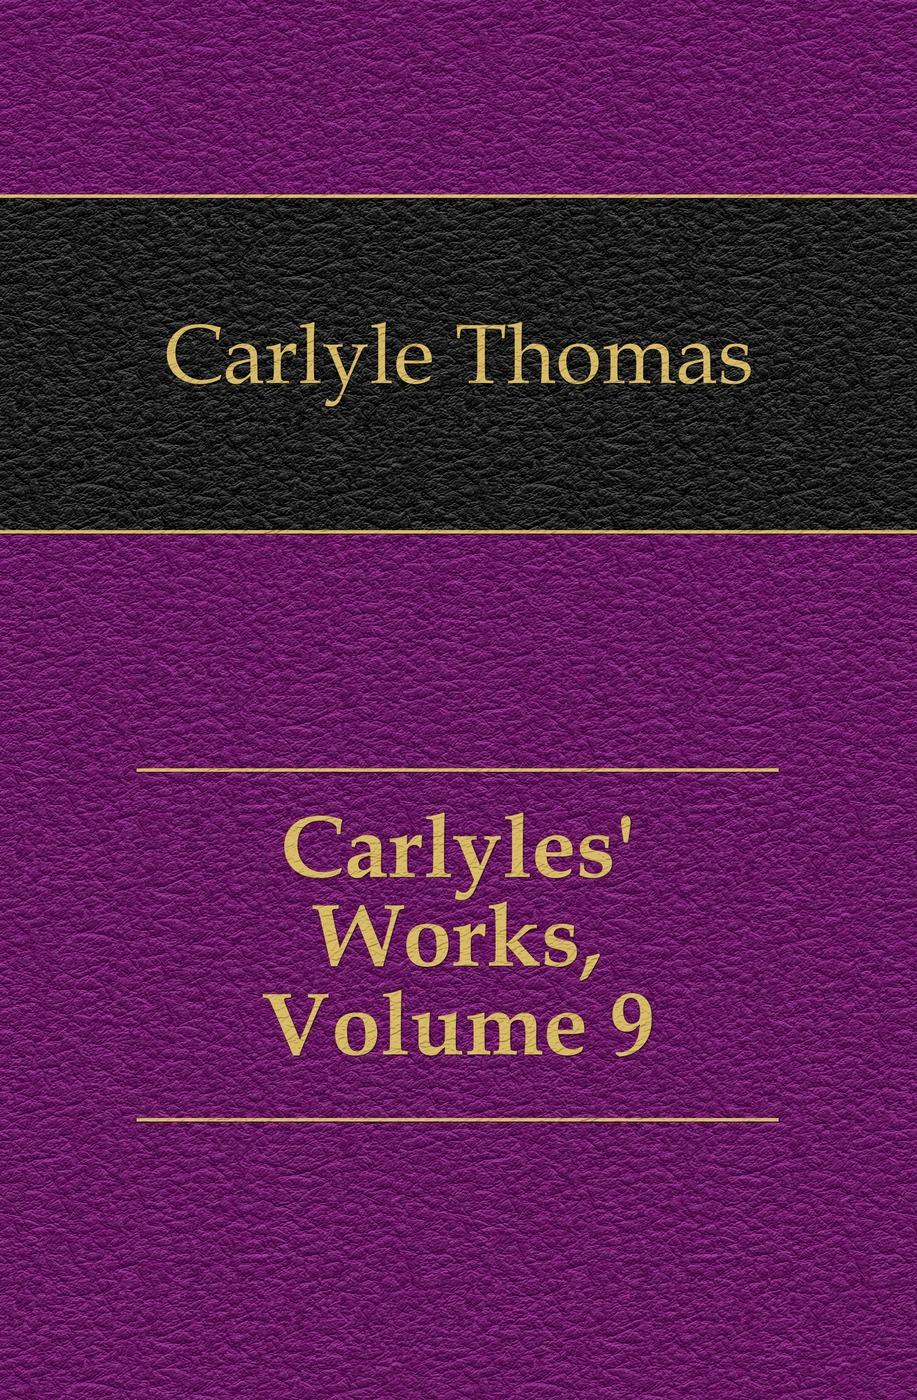 Thomas Carlyle Carlyles' Works, Volume 9 конструктор cobi christmas time